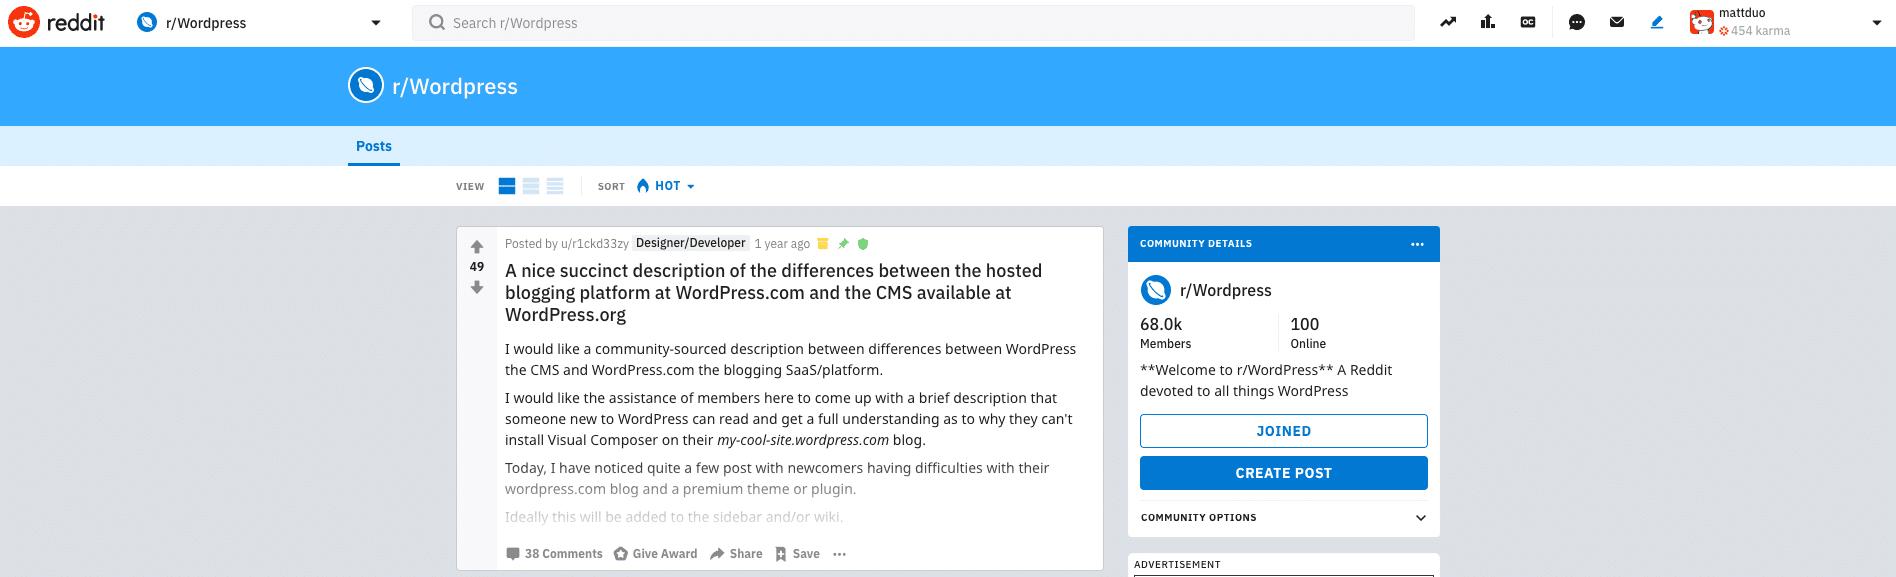 Reddit上的WordPress